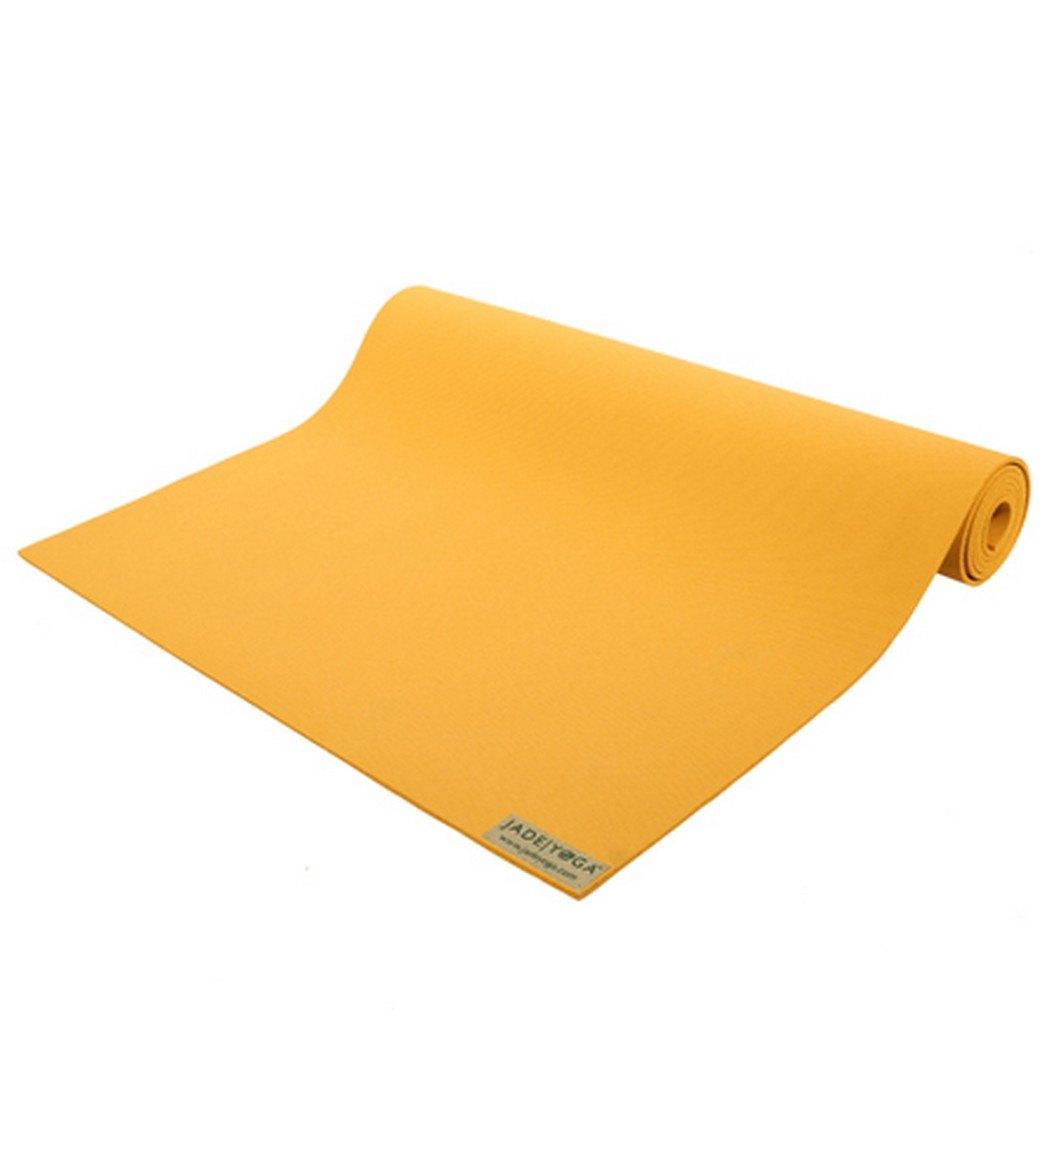 Jade Yoga Mat-Professional - Mahashop